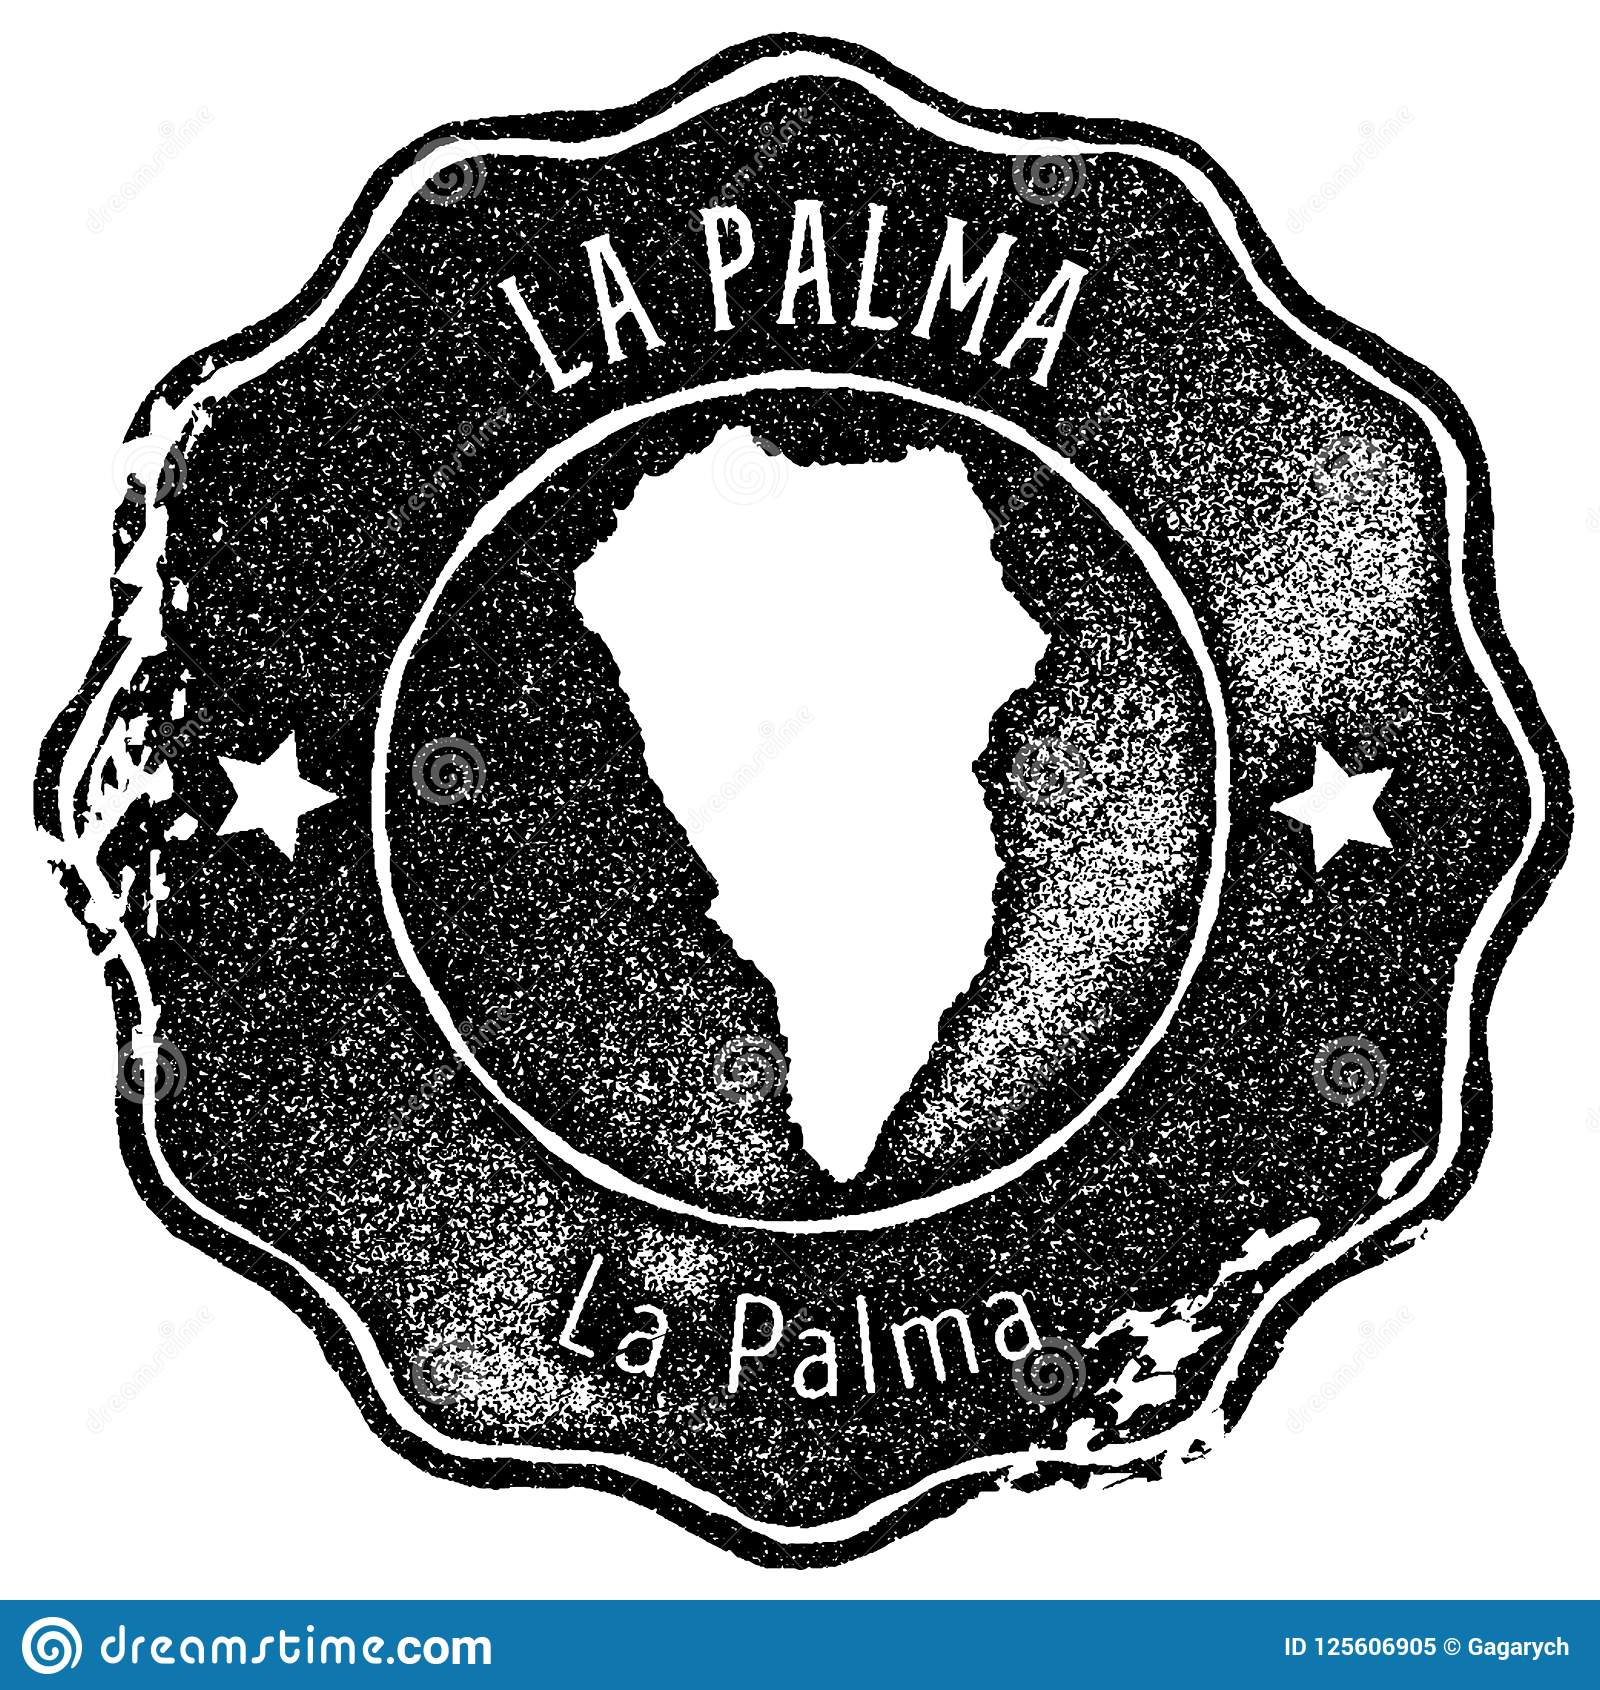 La Palma Map Vintage Stamp. Stock Vector - Illustration of label ...